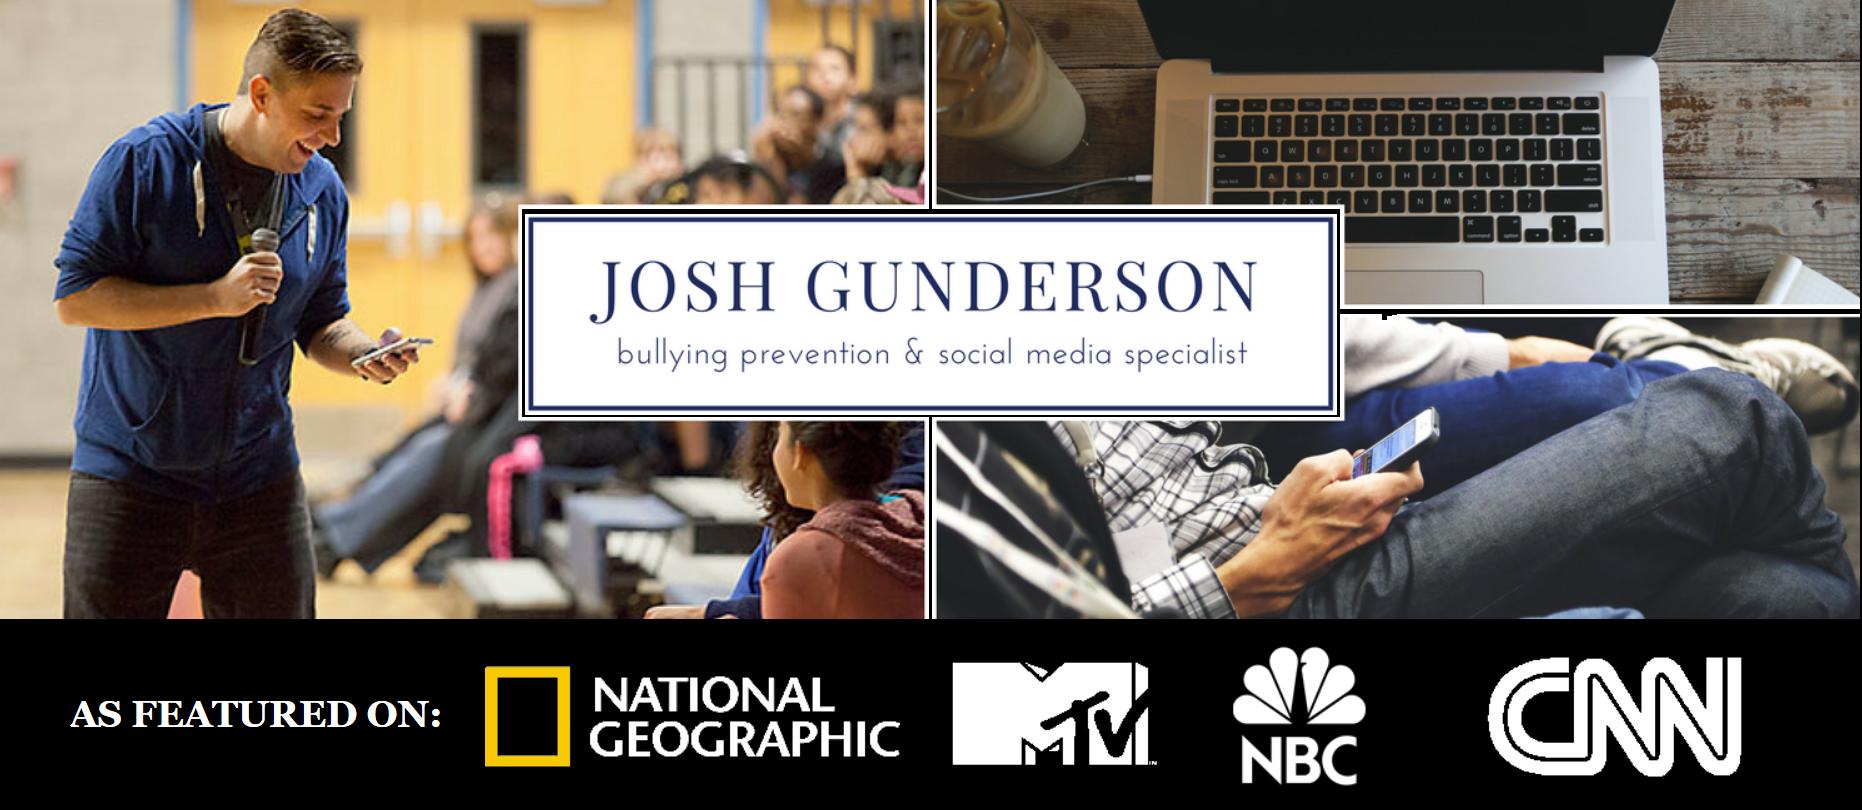 Gunderson Combined